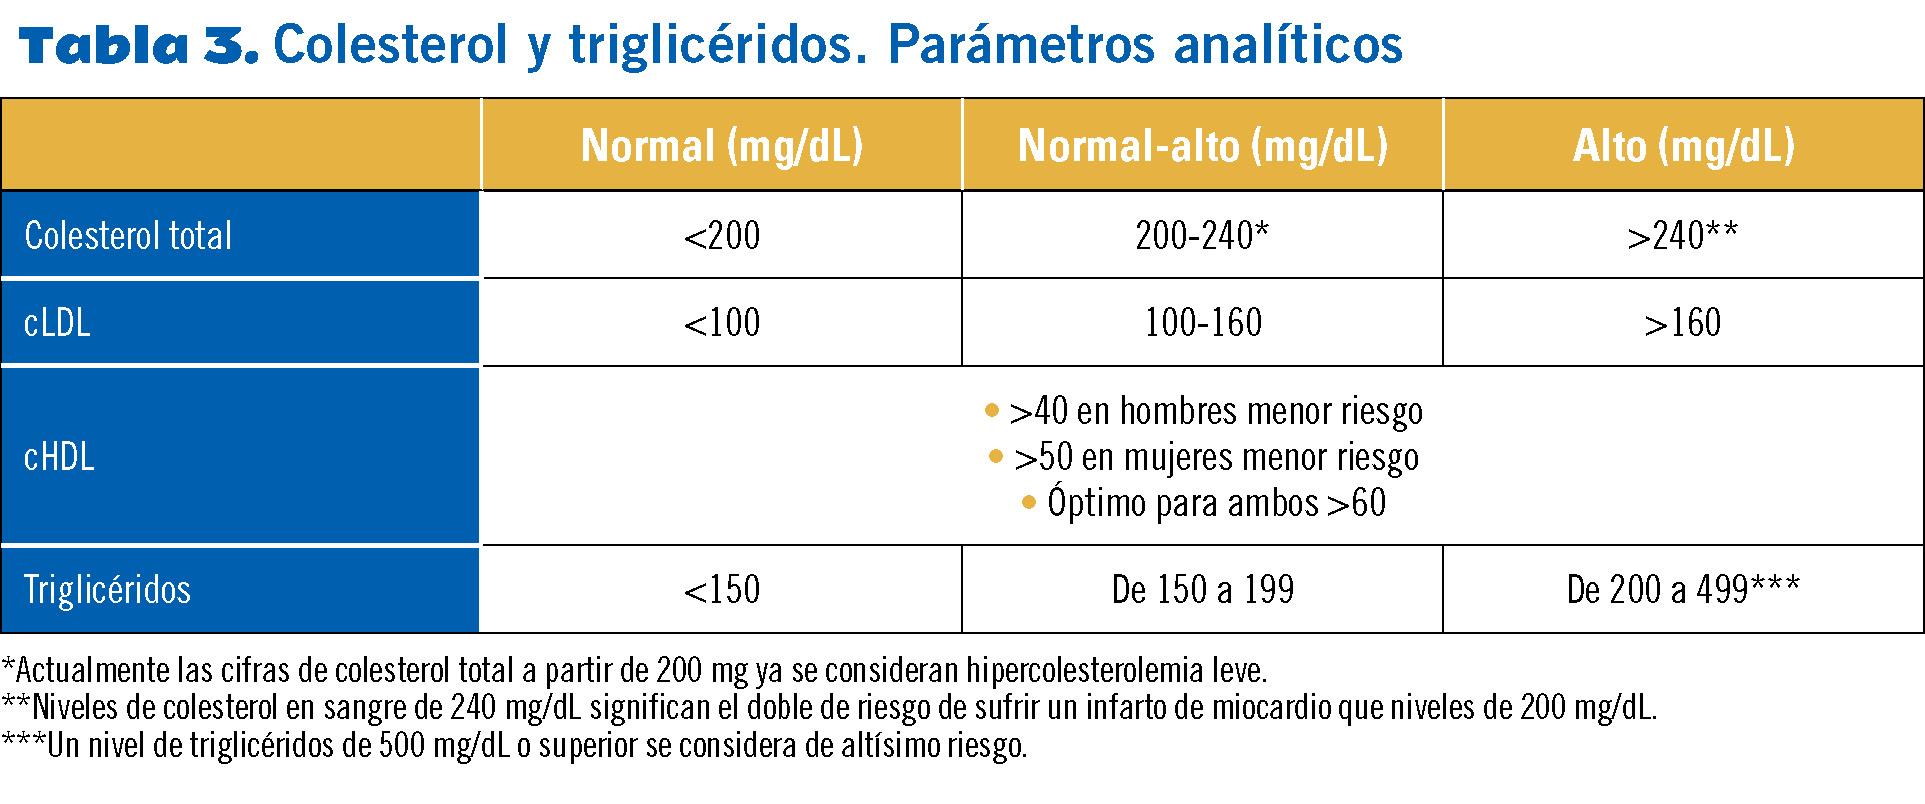 23 EF575 PROTOCOLOS hiperlipidemias tabla 3